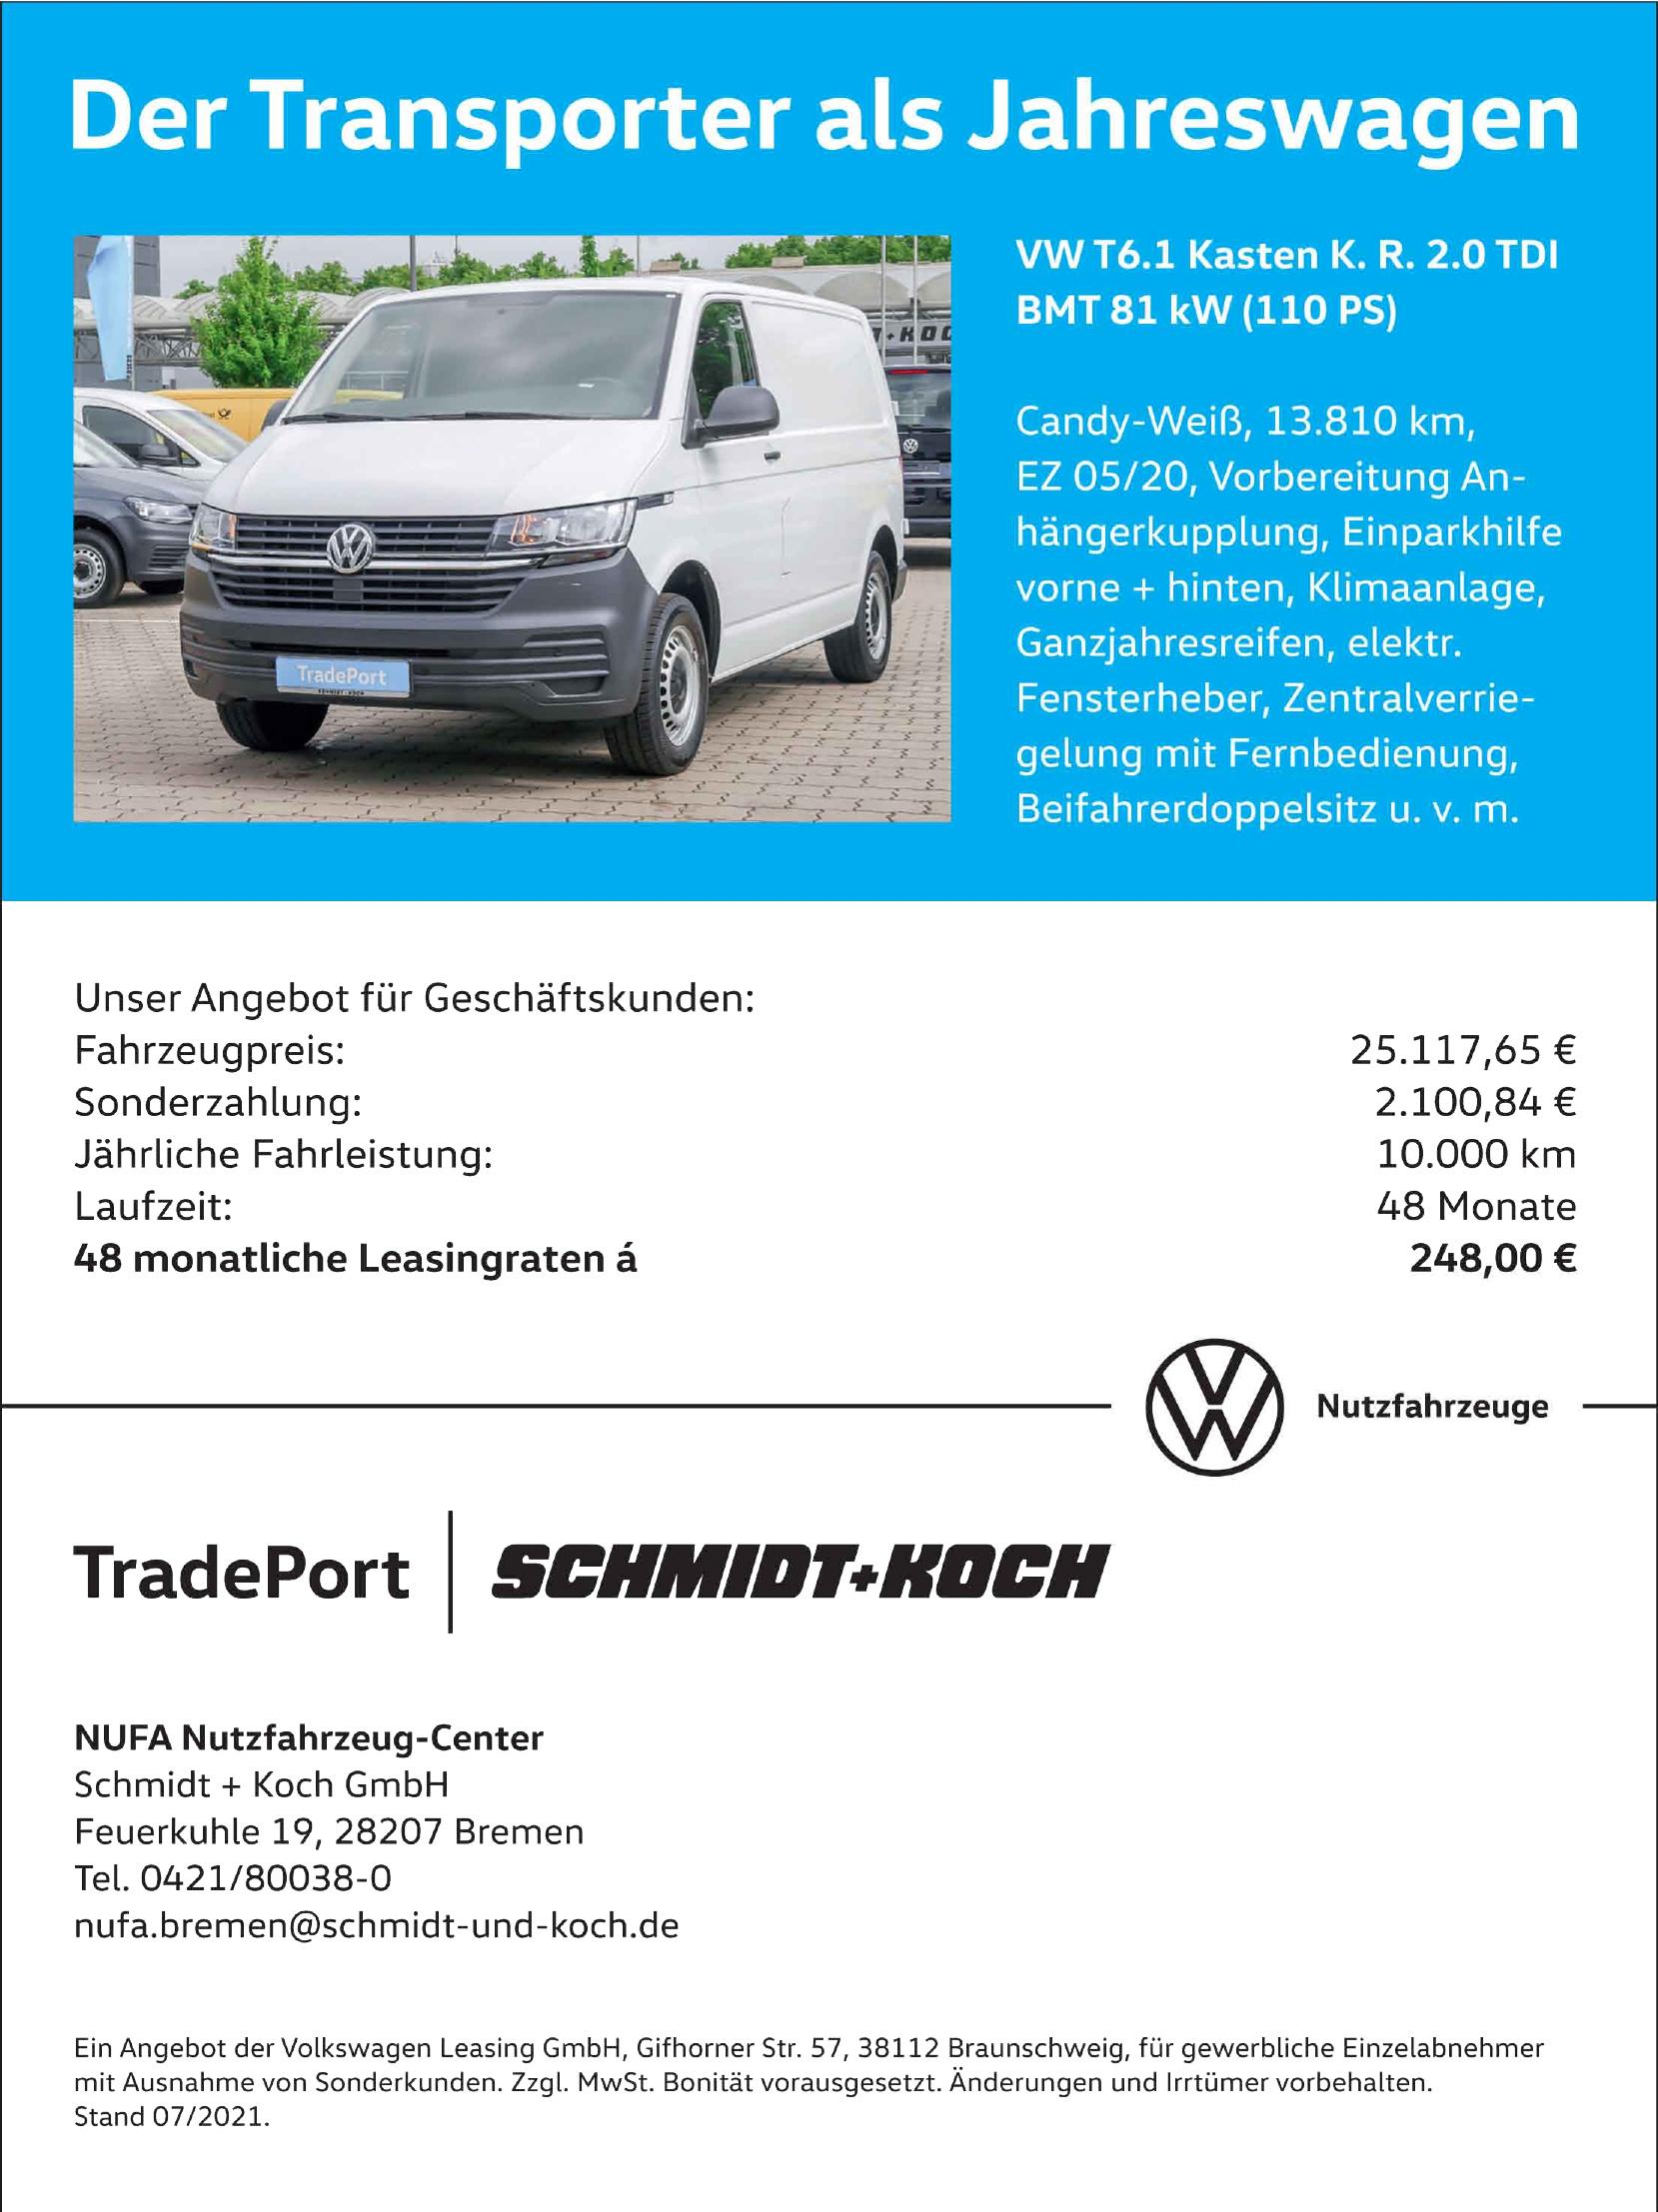 NUFA Nutzfahrzeug-Center Schmidt + Koch GmbH